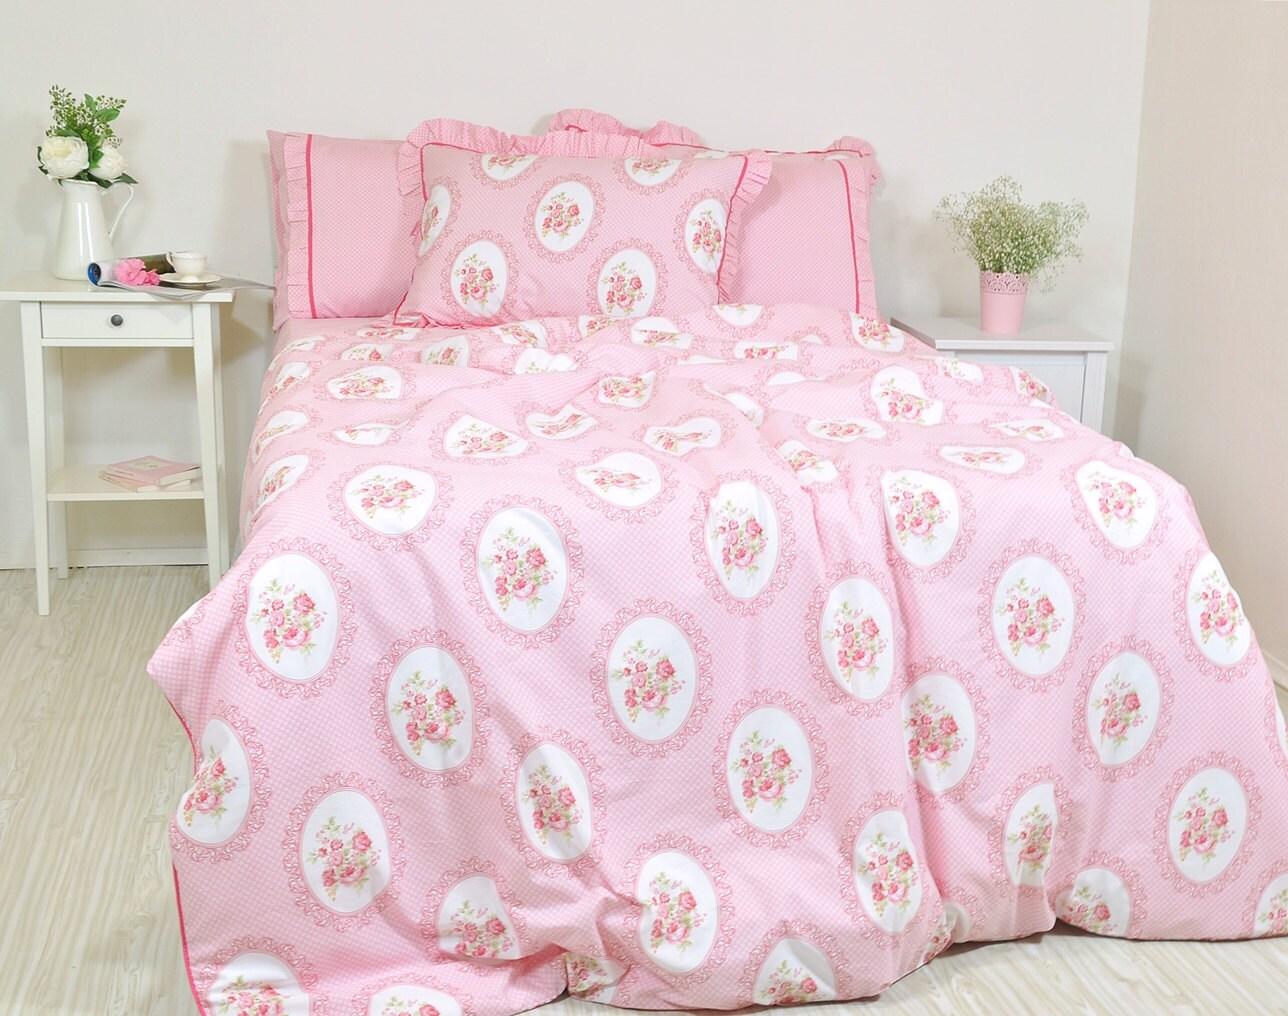 pink floral bedding in full queen king size victorian rose. Black Bedroom Furniture Sets. Home Design Ideas